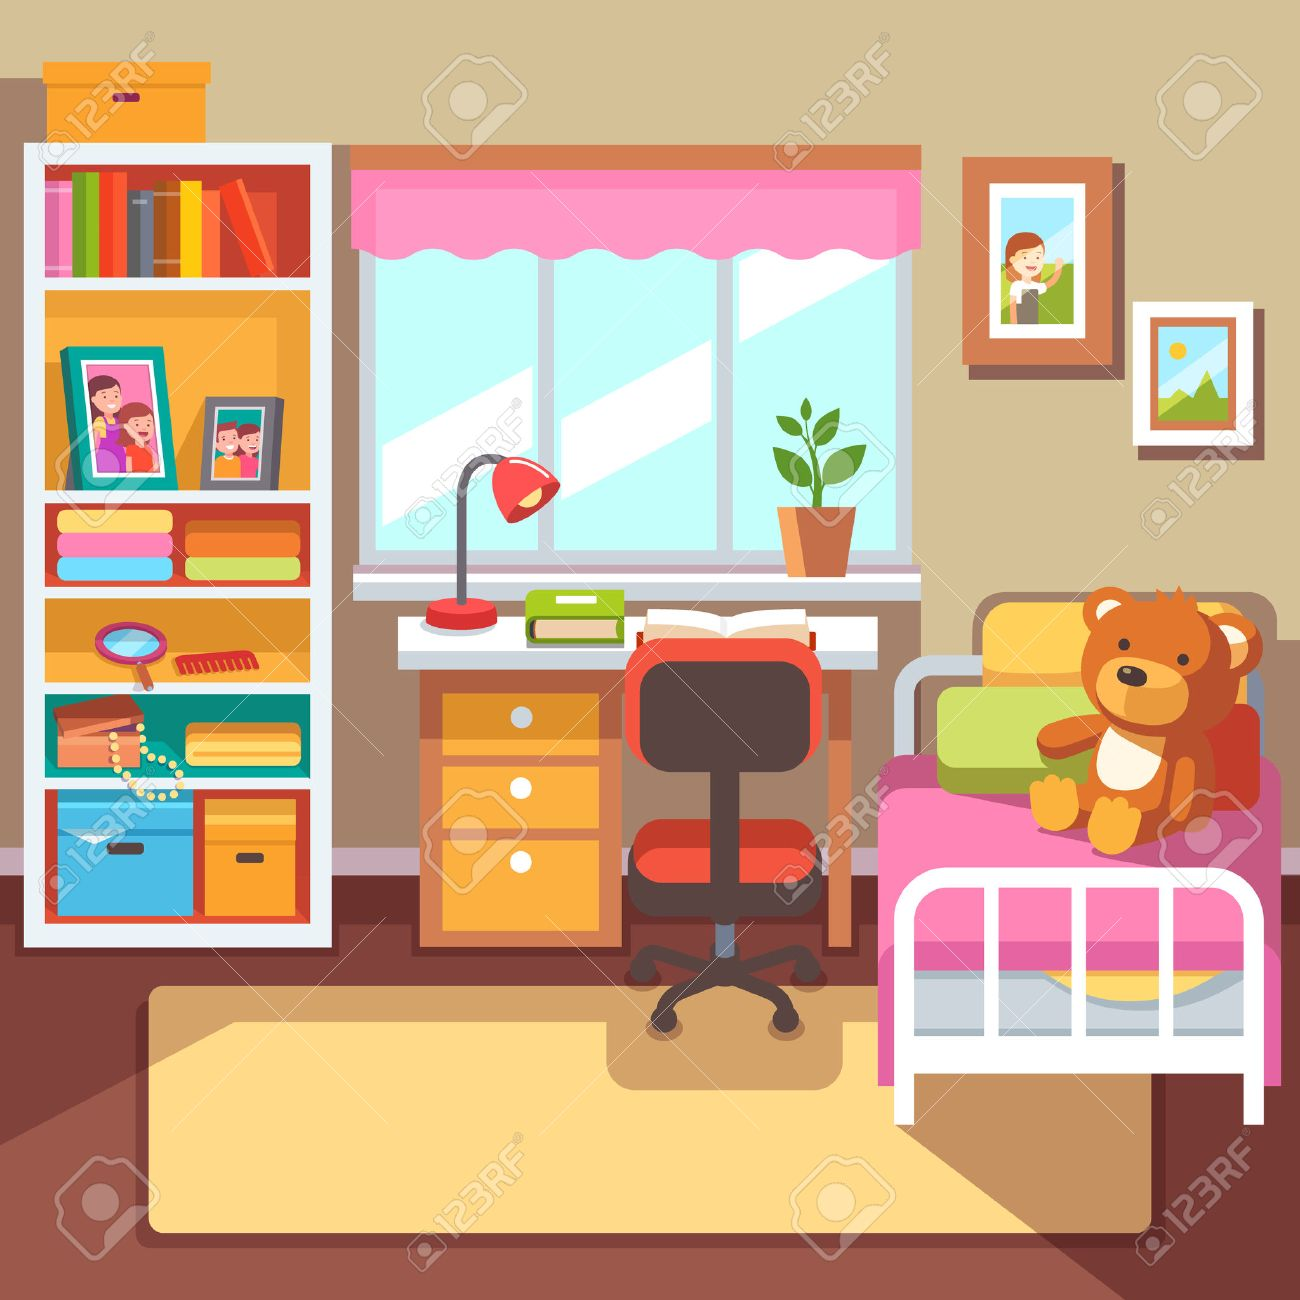 School Window Clipart preschool or school student girls room interior. study desk at